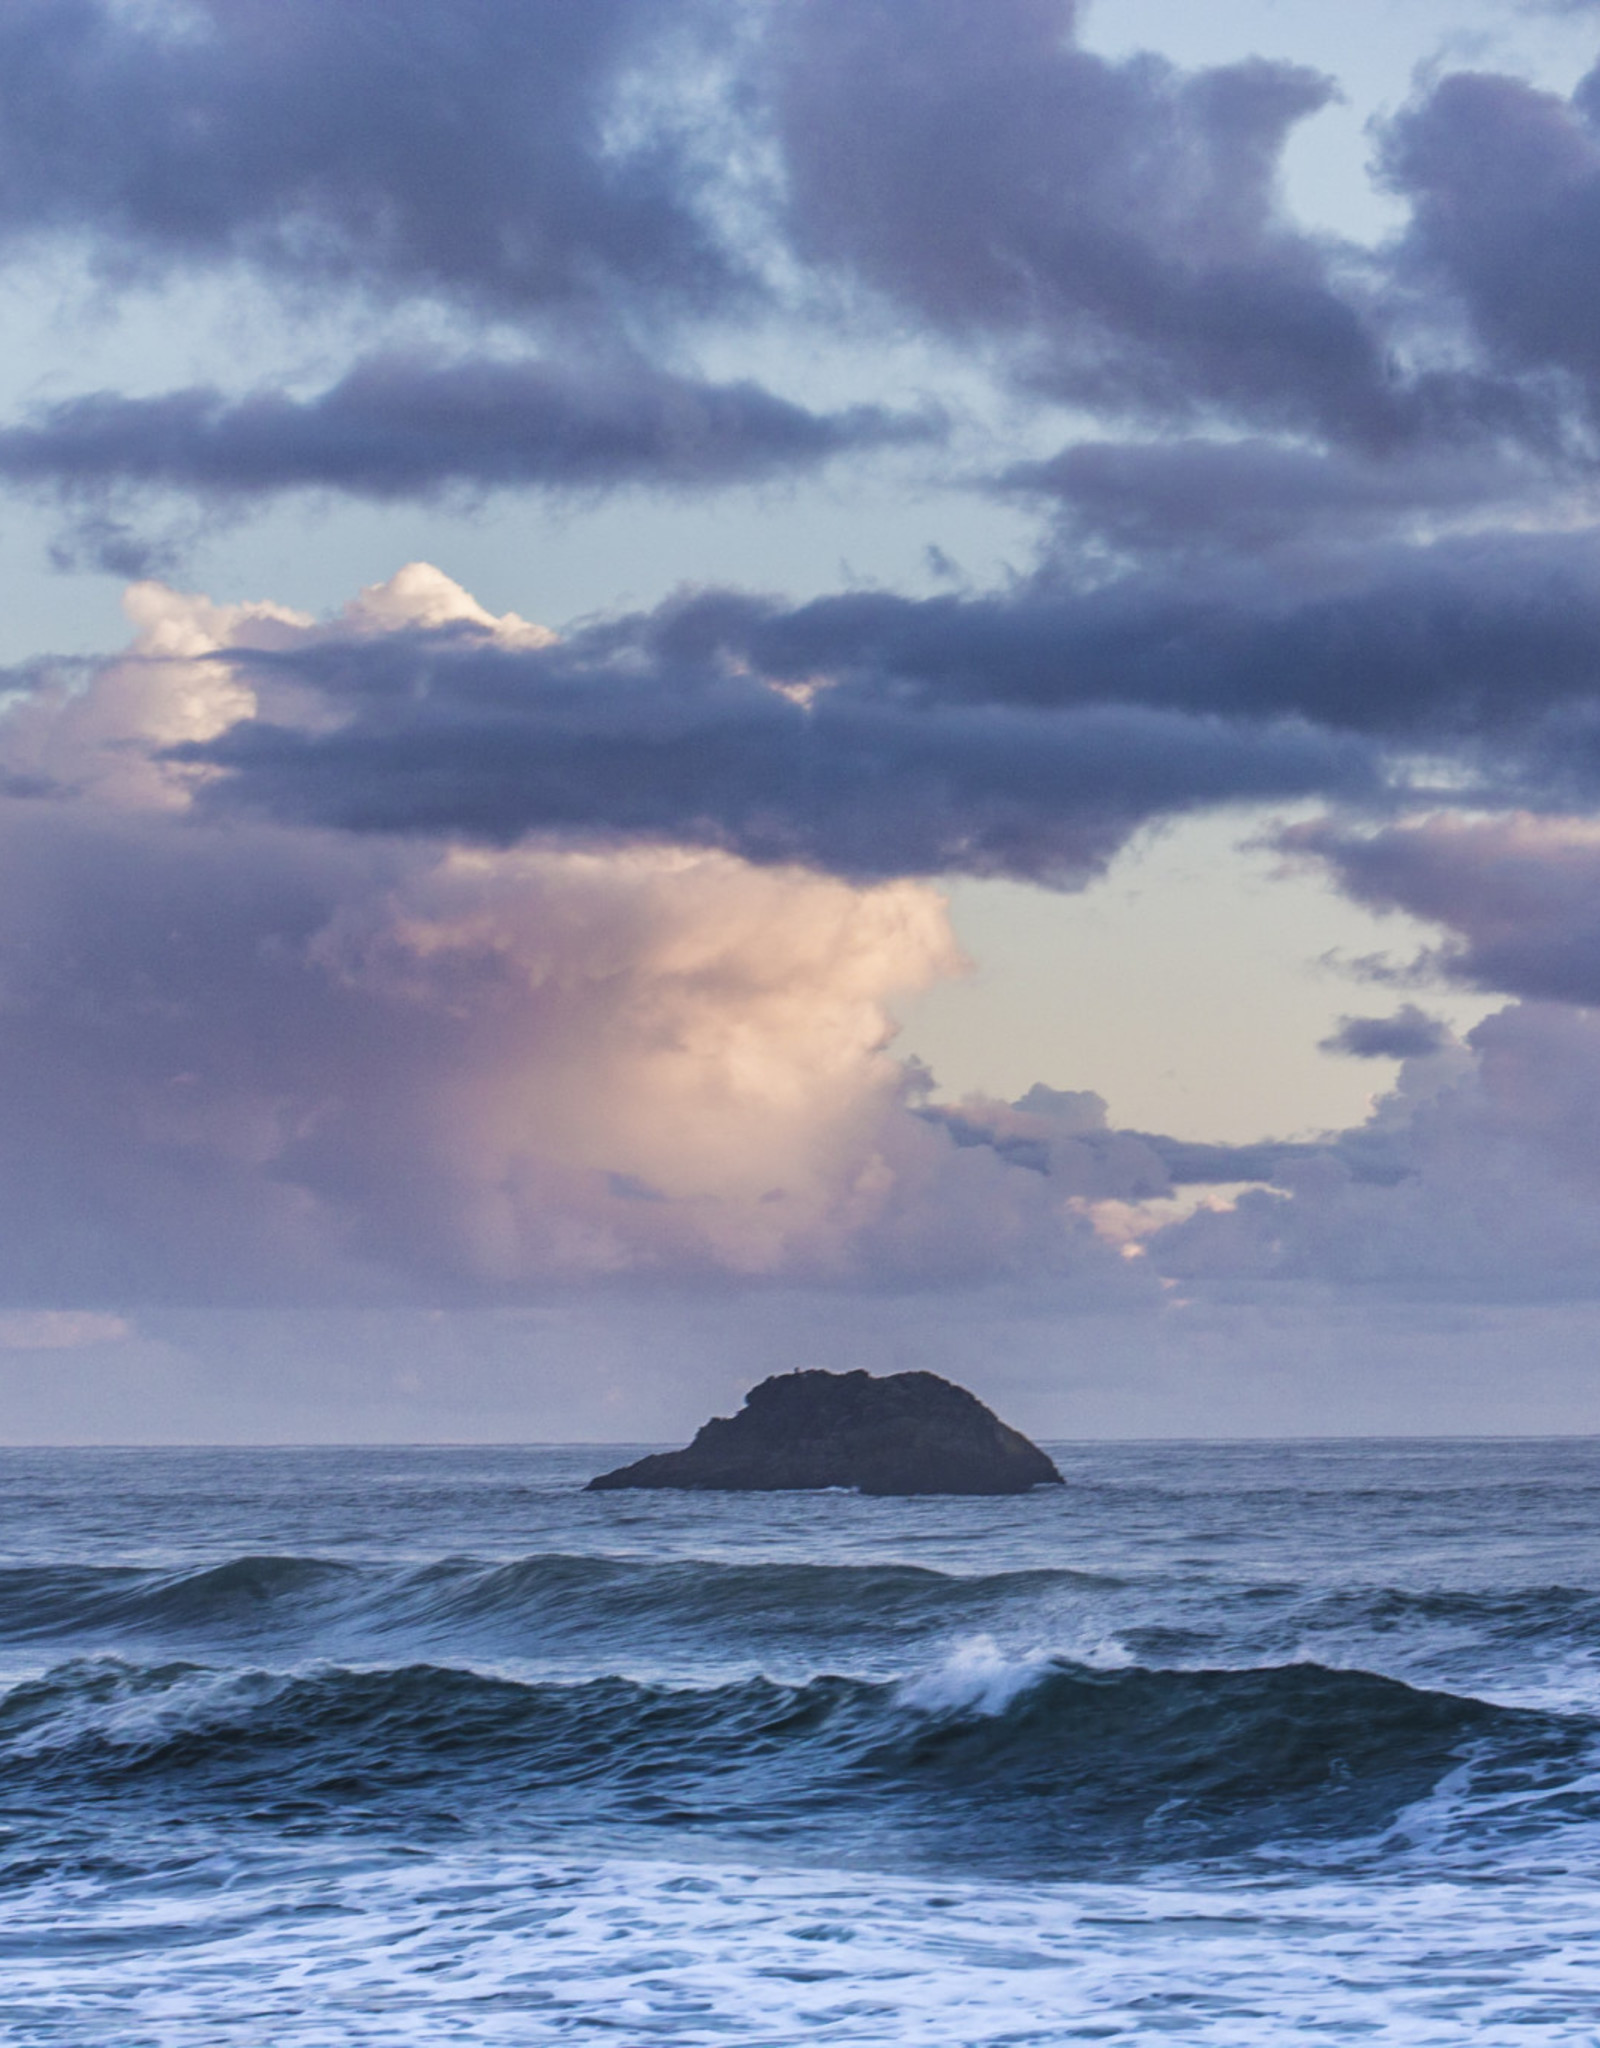 Alicia Hill Colors of the Oregon Coast, greeting card